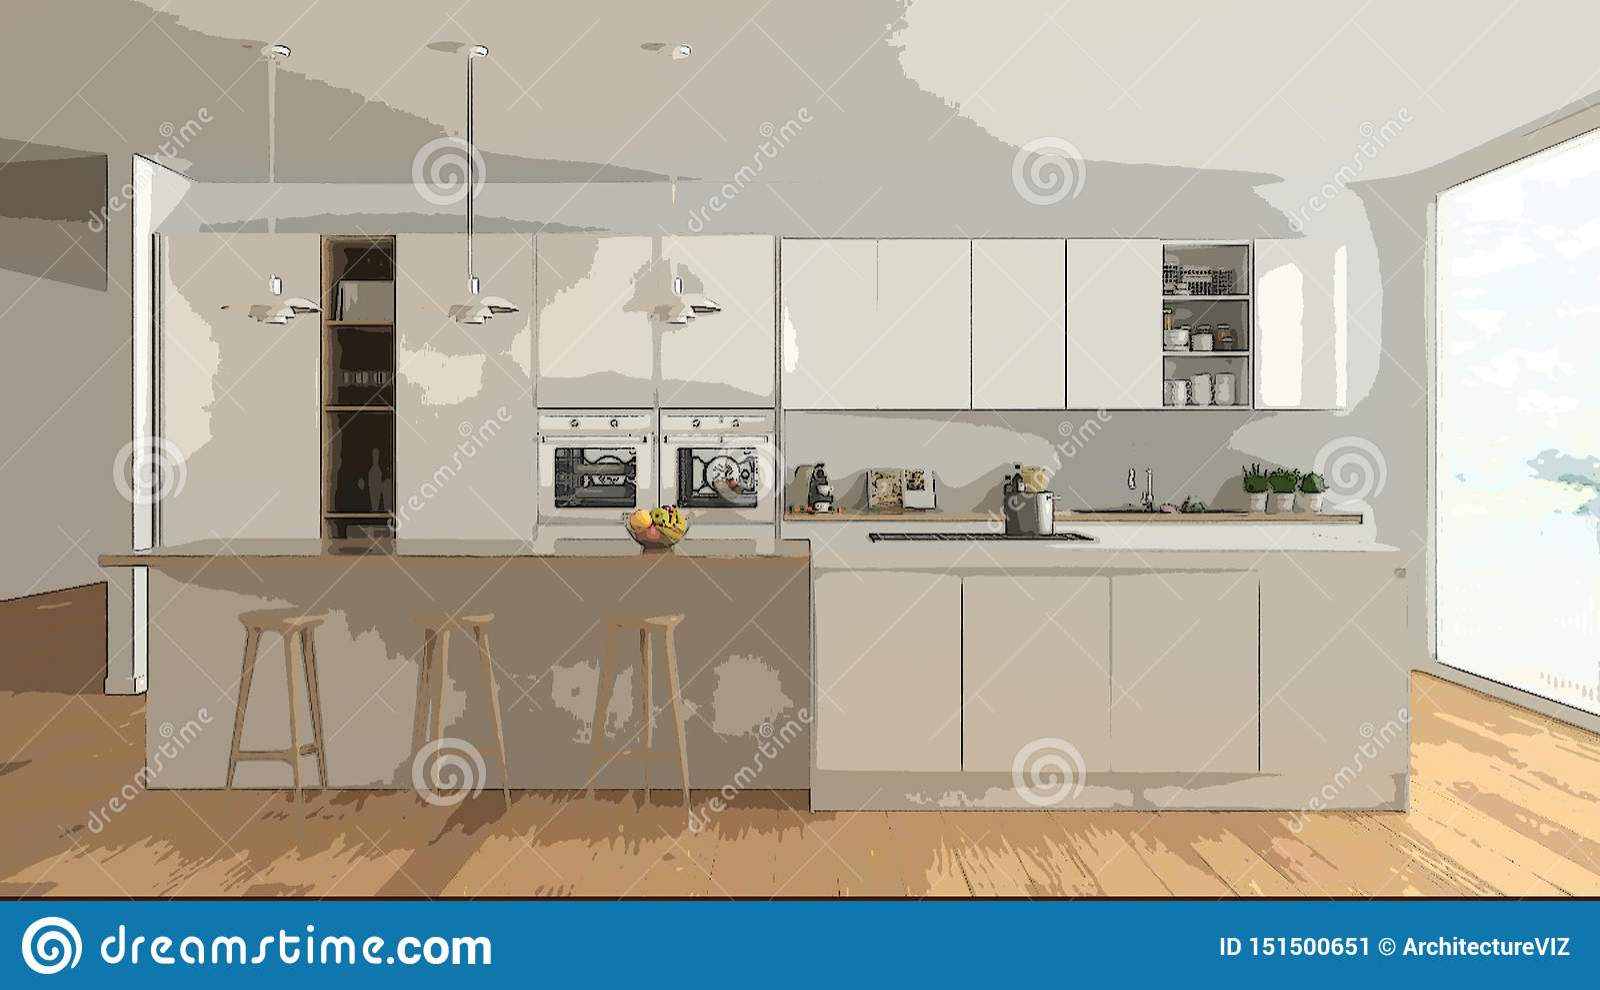 Cartoon Illustration Of Cozy Modern Kitchen Interior Design